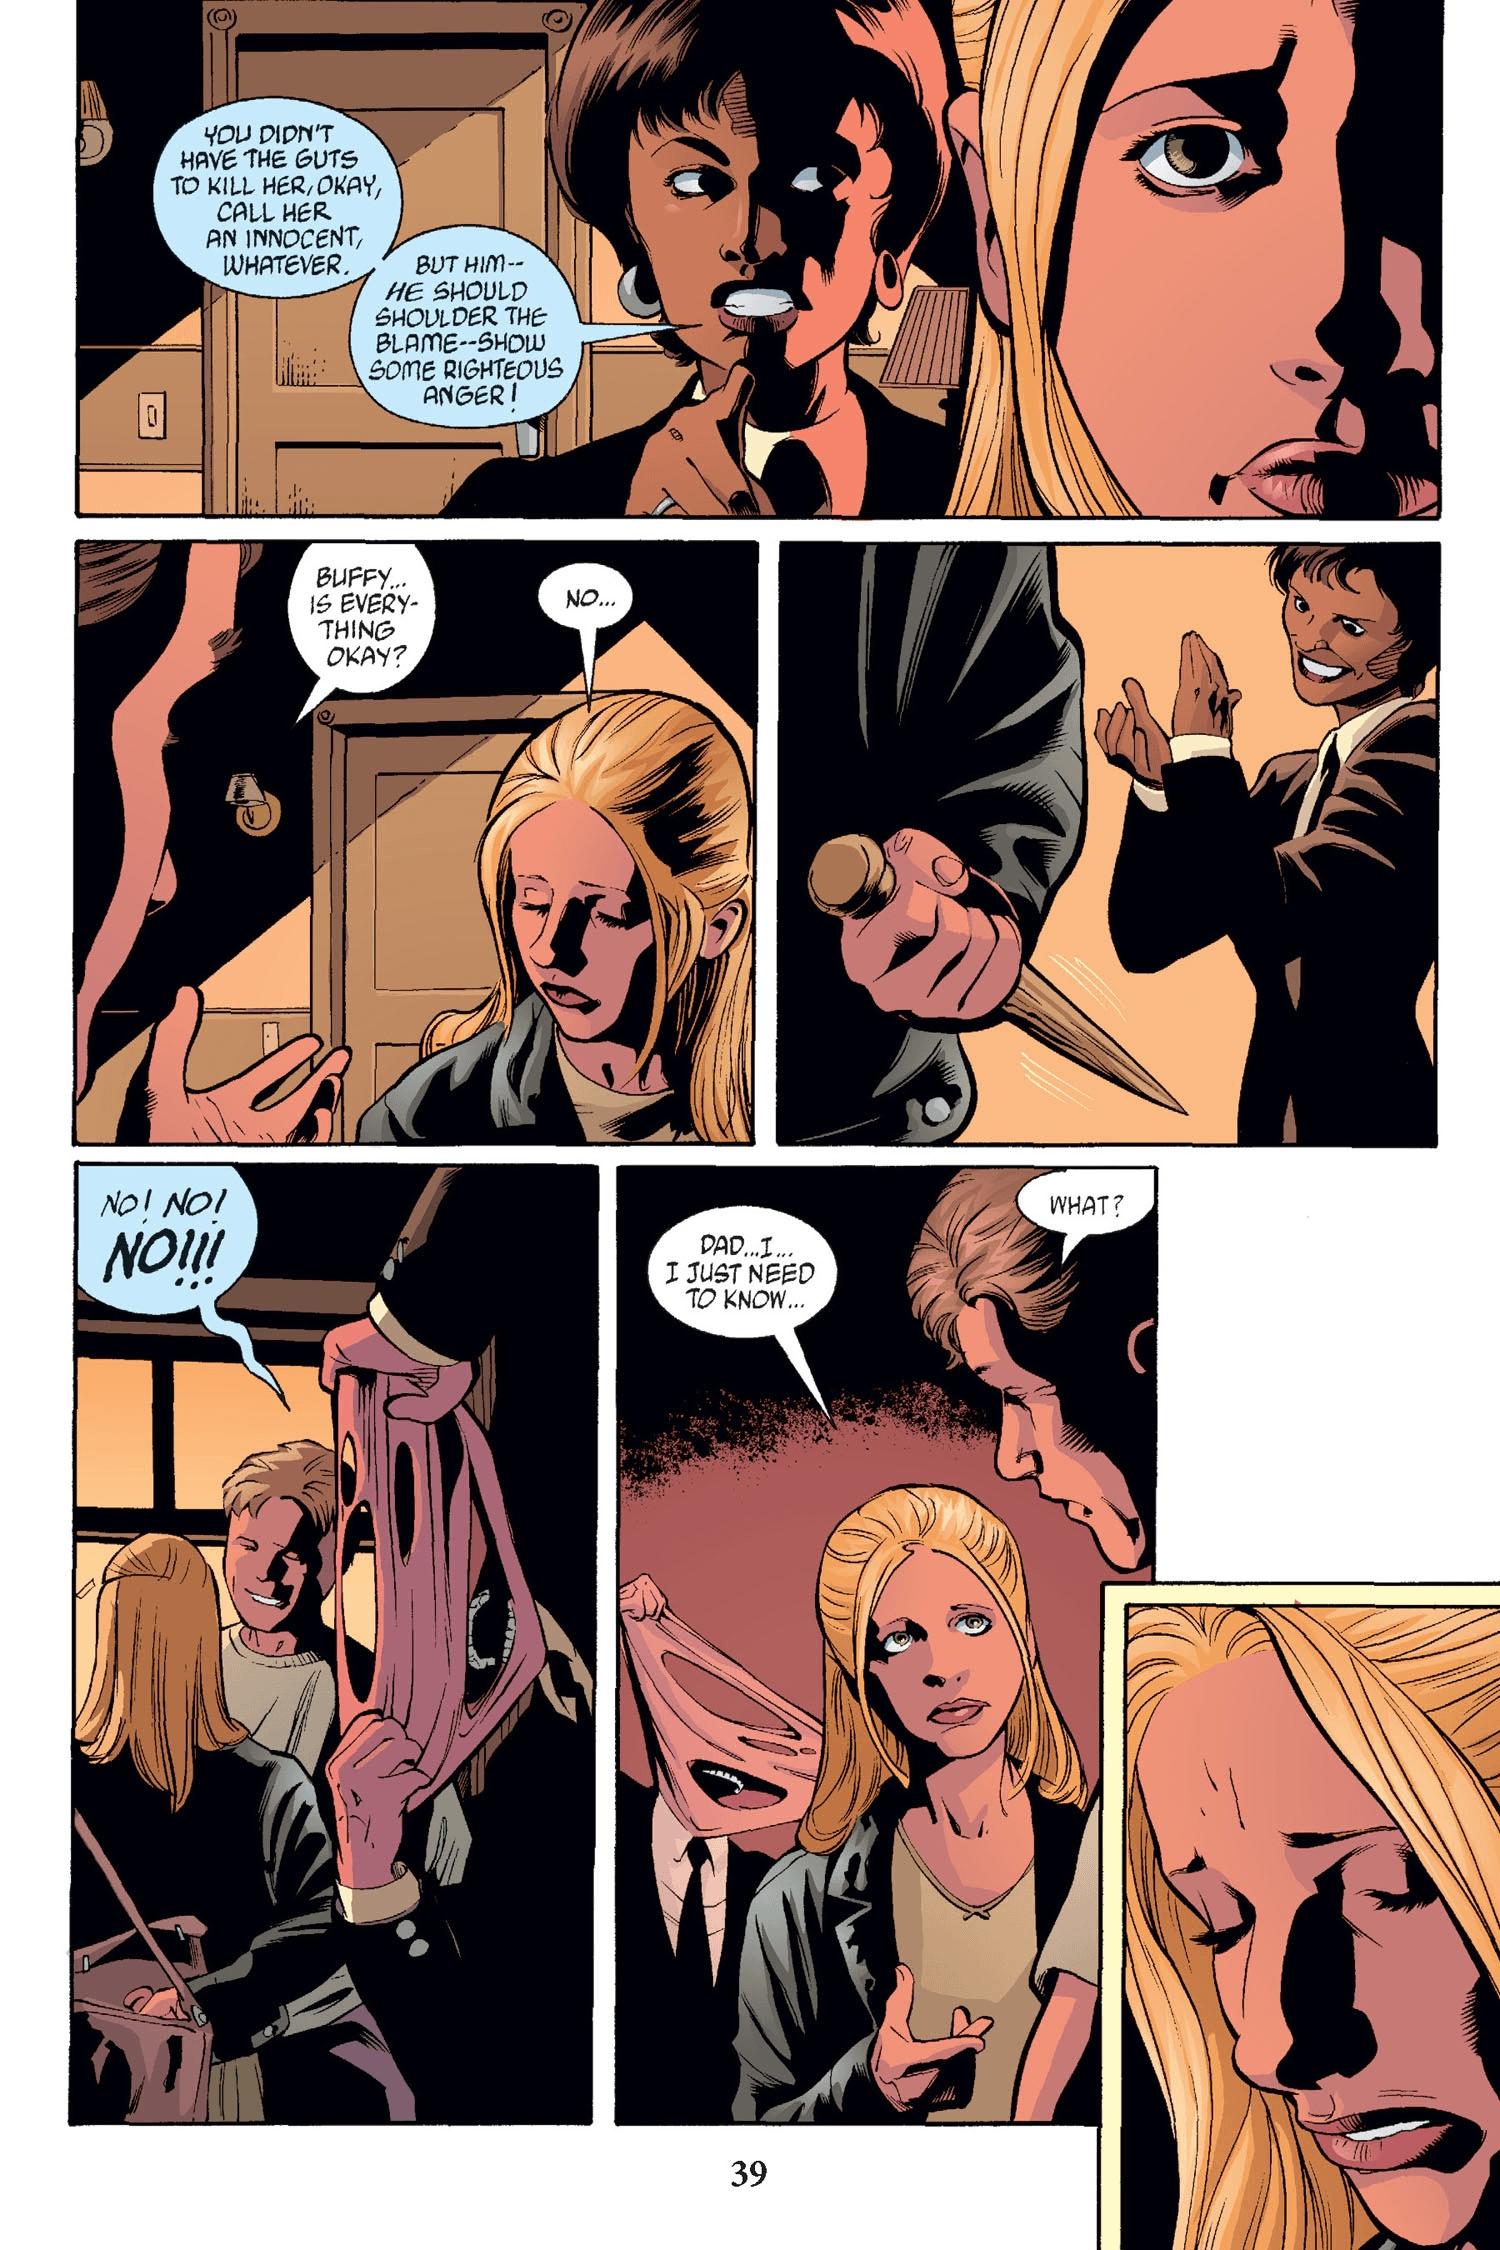 Read online Buffy the Vampire Slayer: Omnibus comic -  Issue # TPB 2 - 38